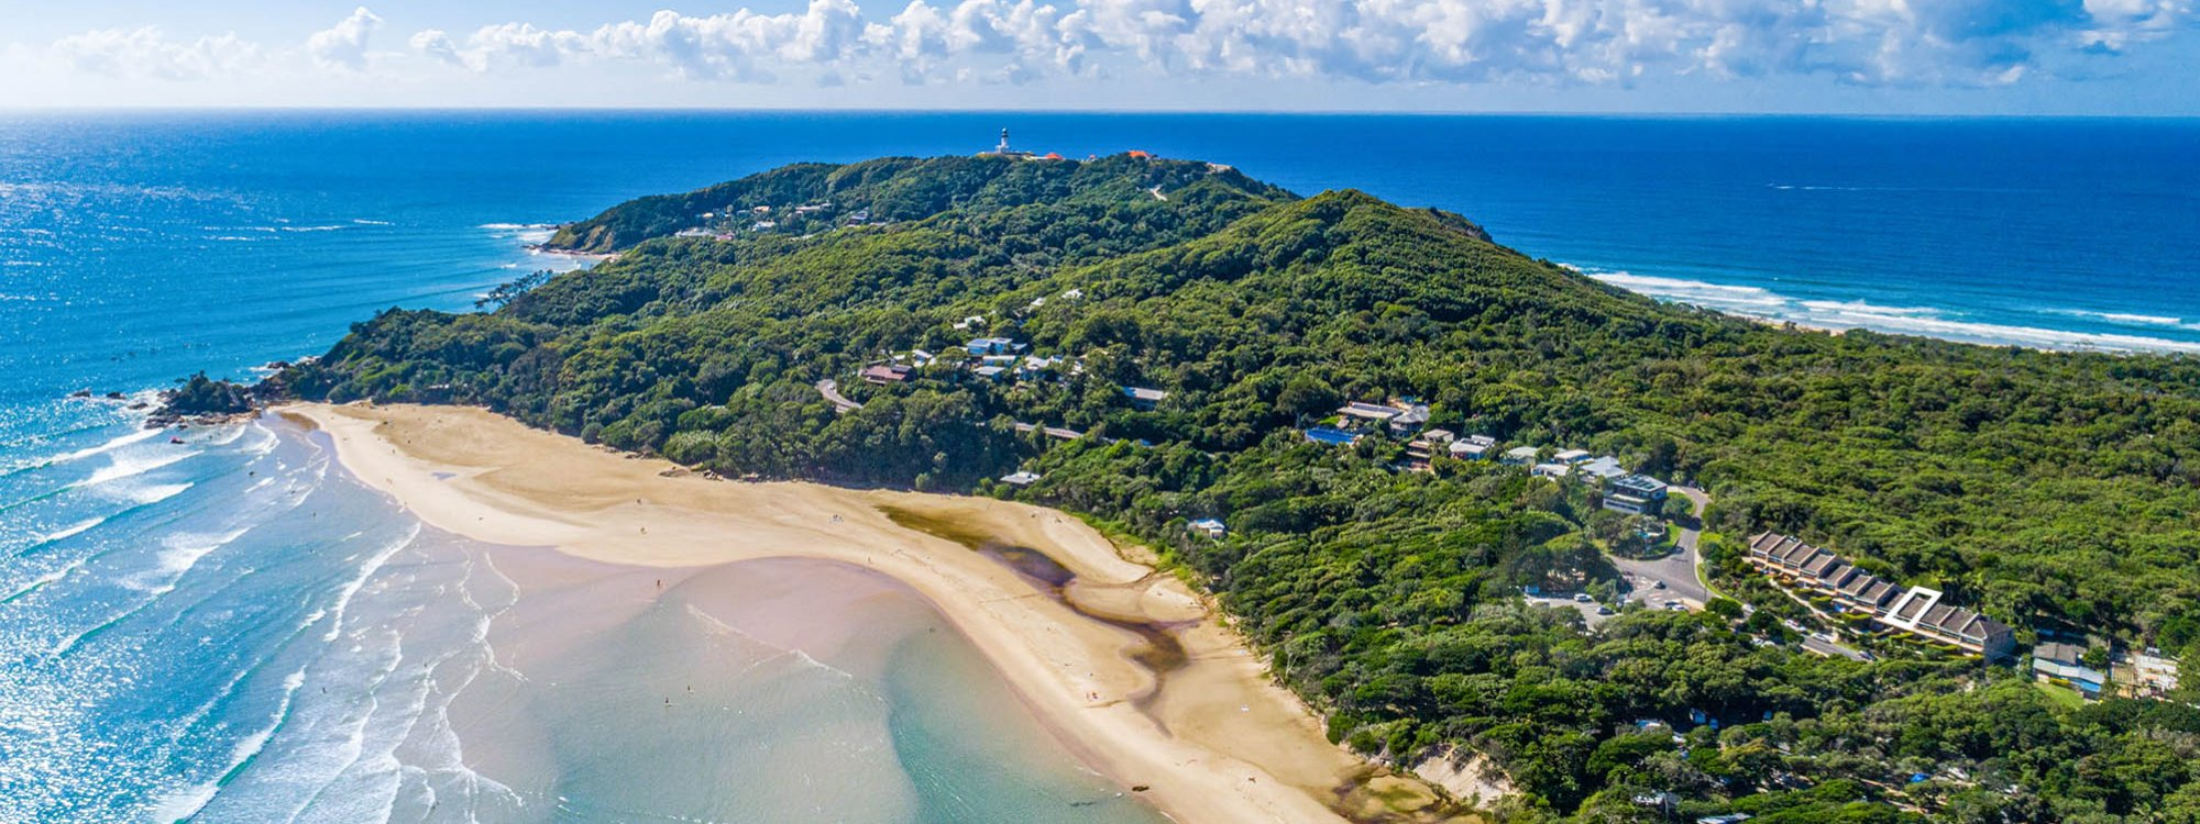 4 James Cook - Byron Bay - Aerial towards Lighthouse c